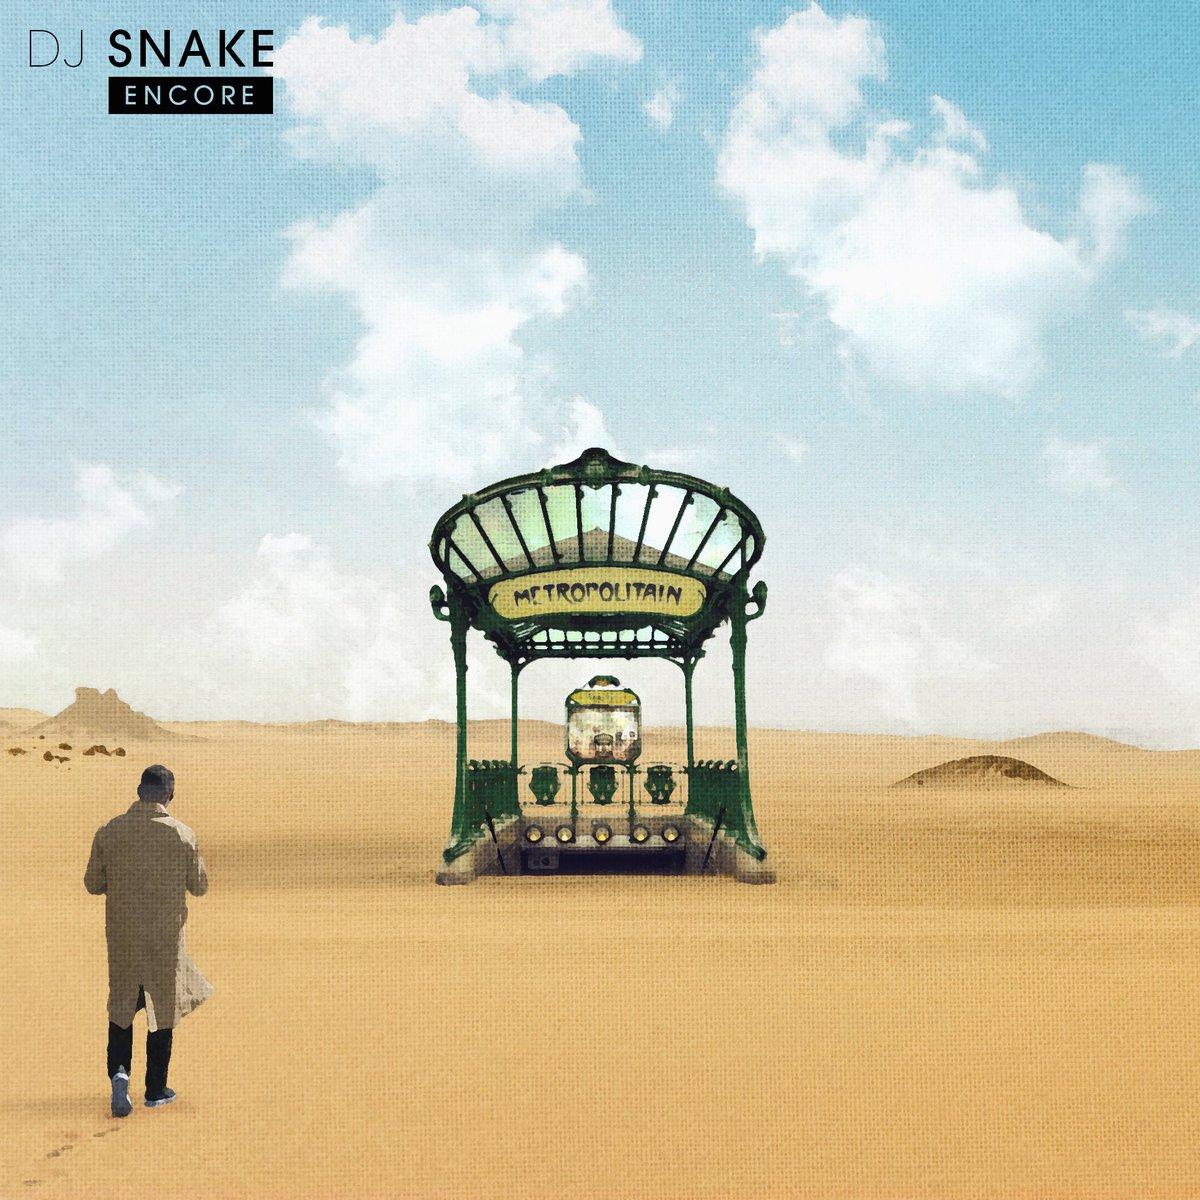 Resultado de imagen de dj snake let me love you